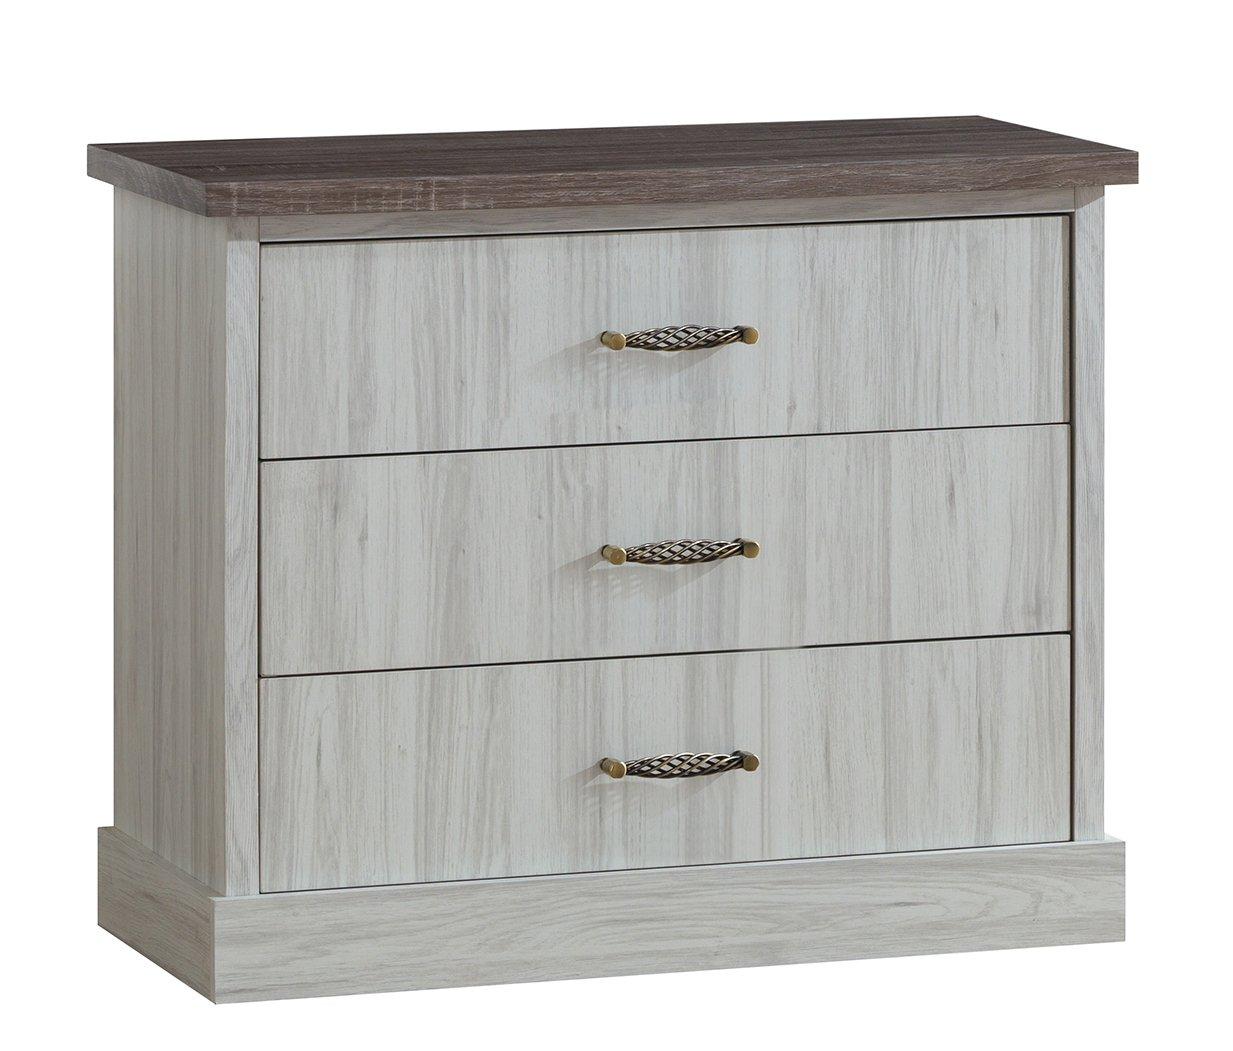 Commode contemporaine 3 tiroirs chêne clair/marron Solange